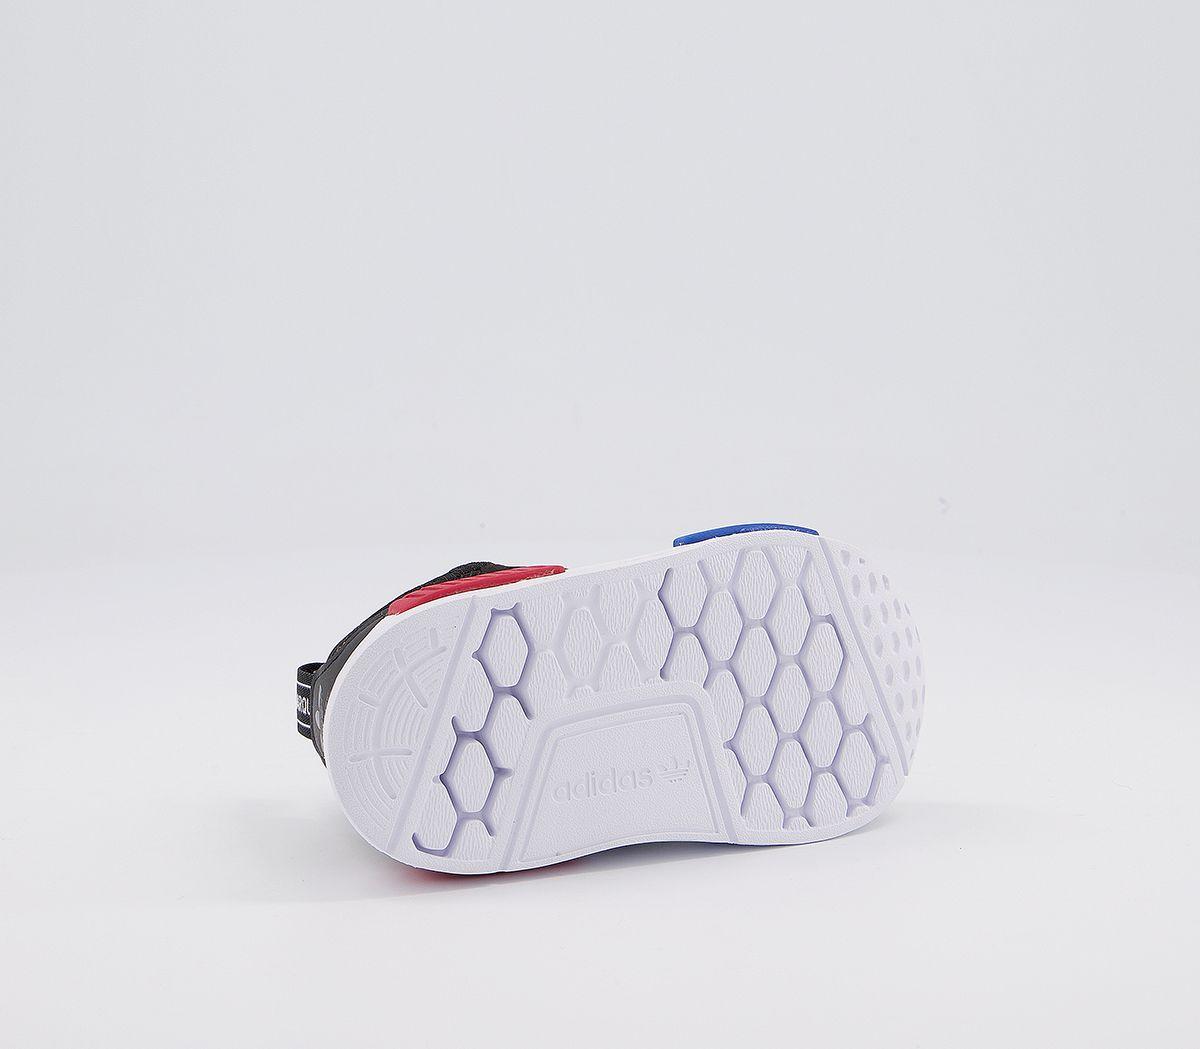 Kids-Adidas-Nmd-360-I-Infant-Trainers-Core-Black-Kids thumbnail 8